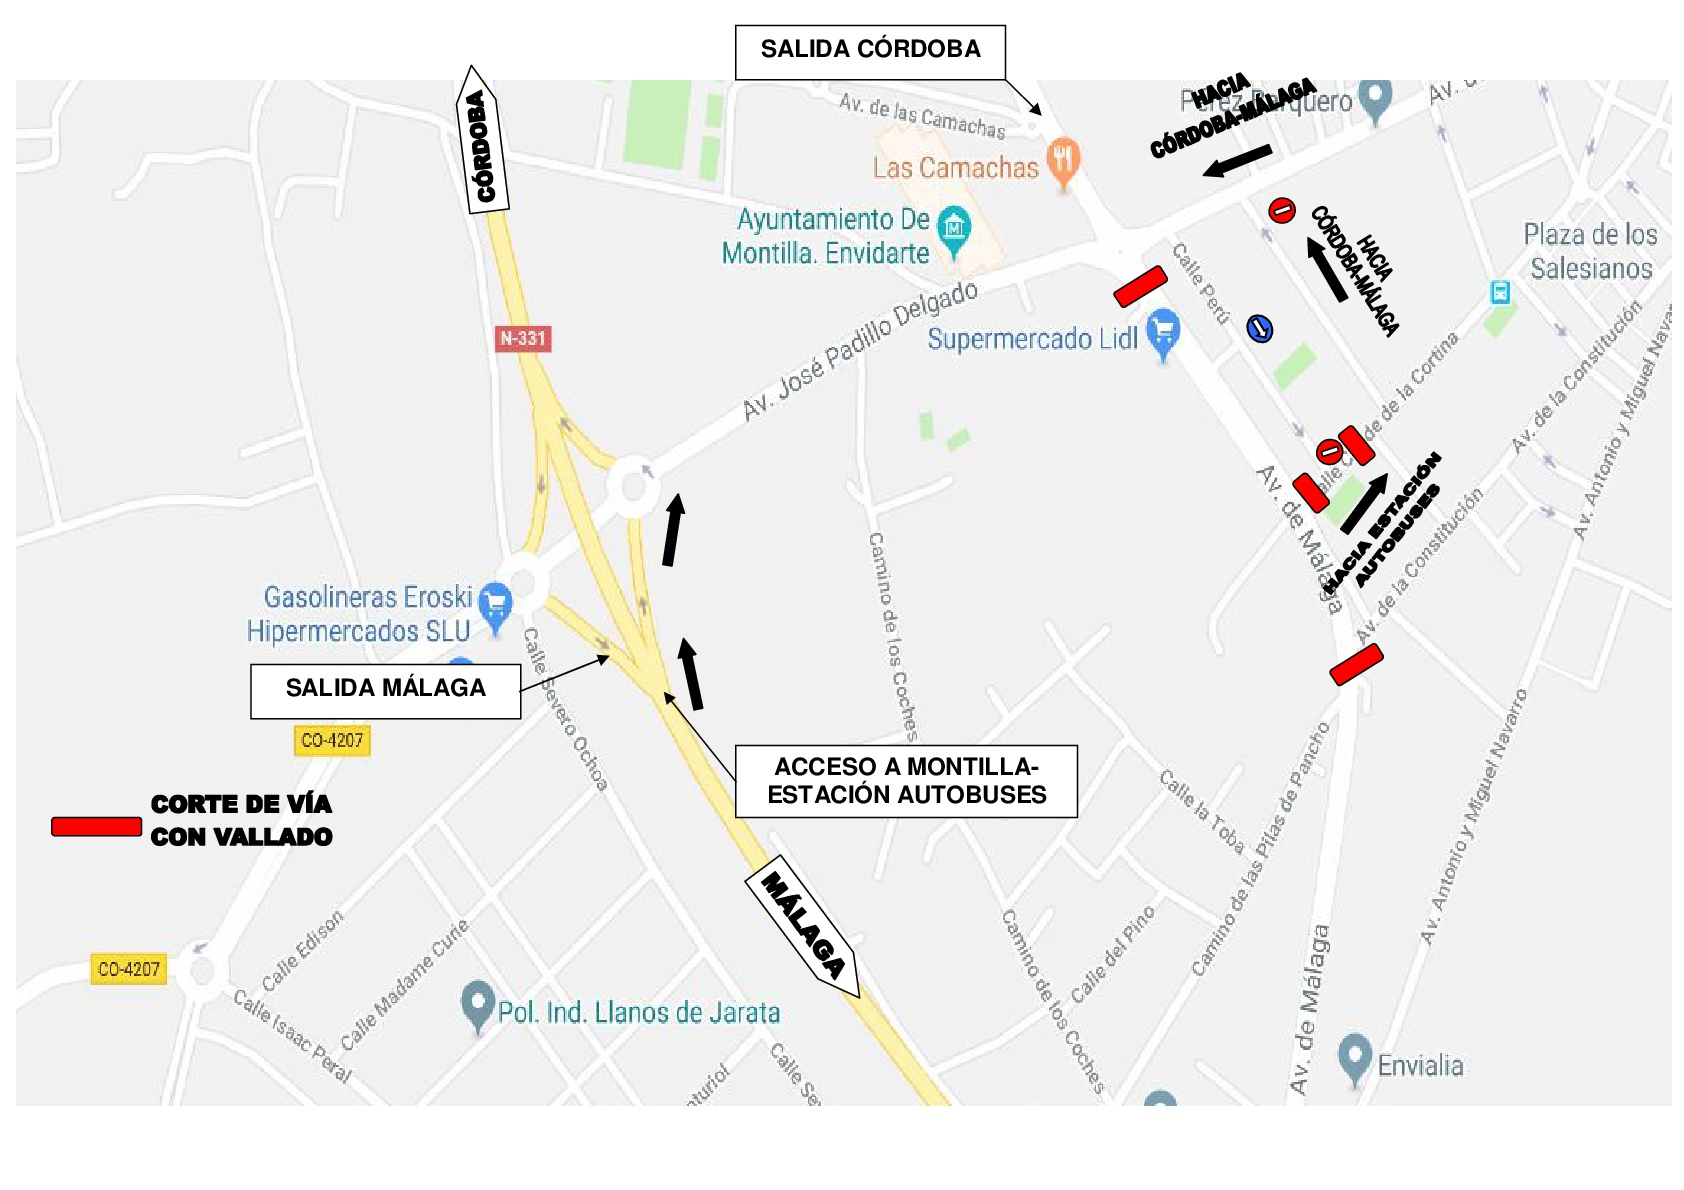 plano_ordenacion_trafico_construccion_rotondas_avd_malaga-001